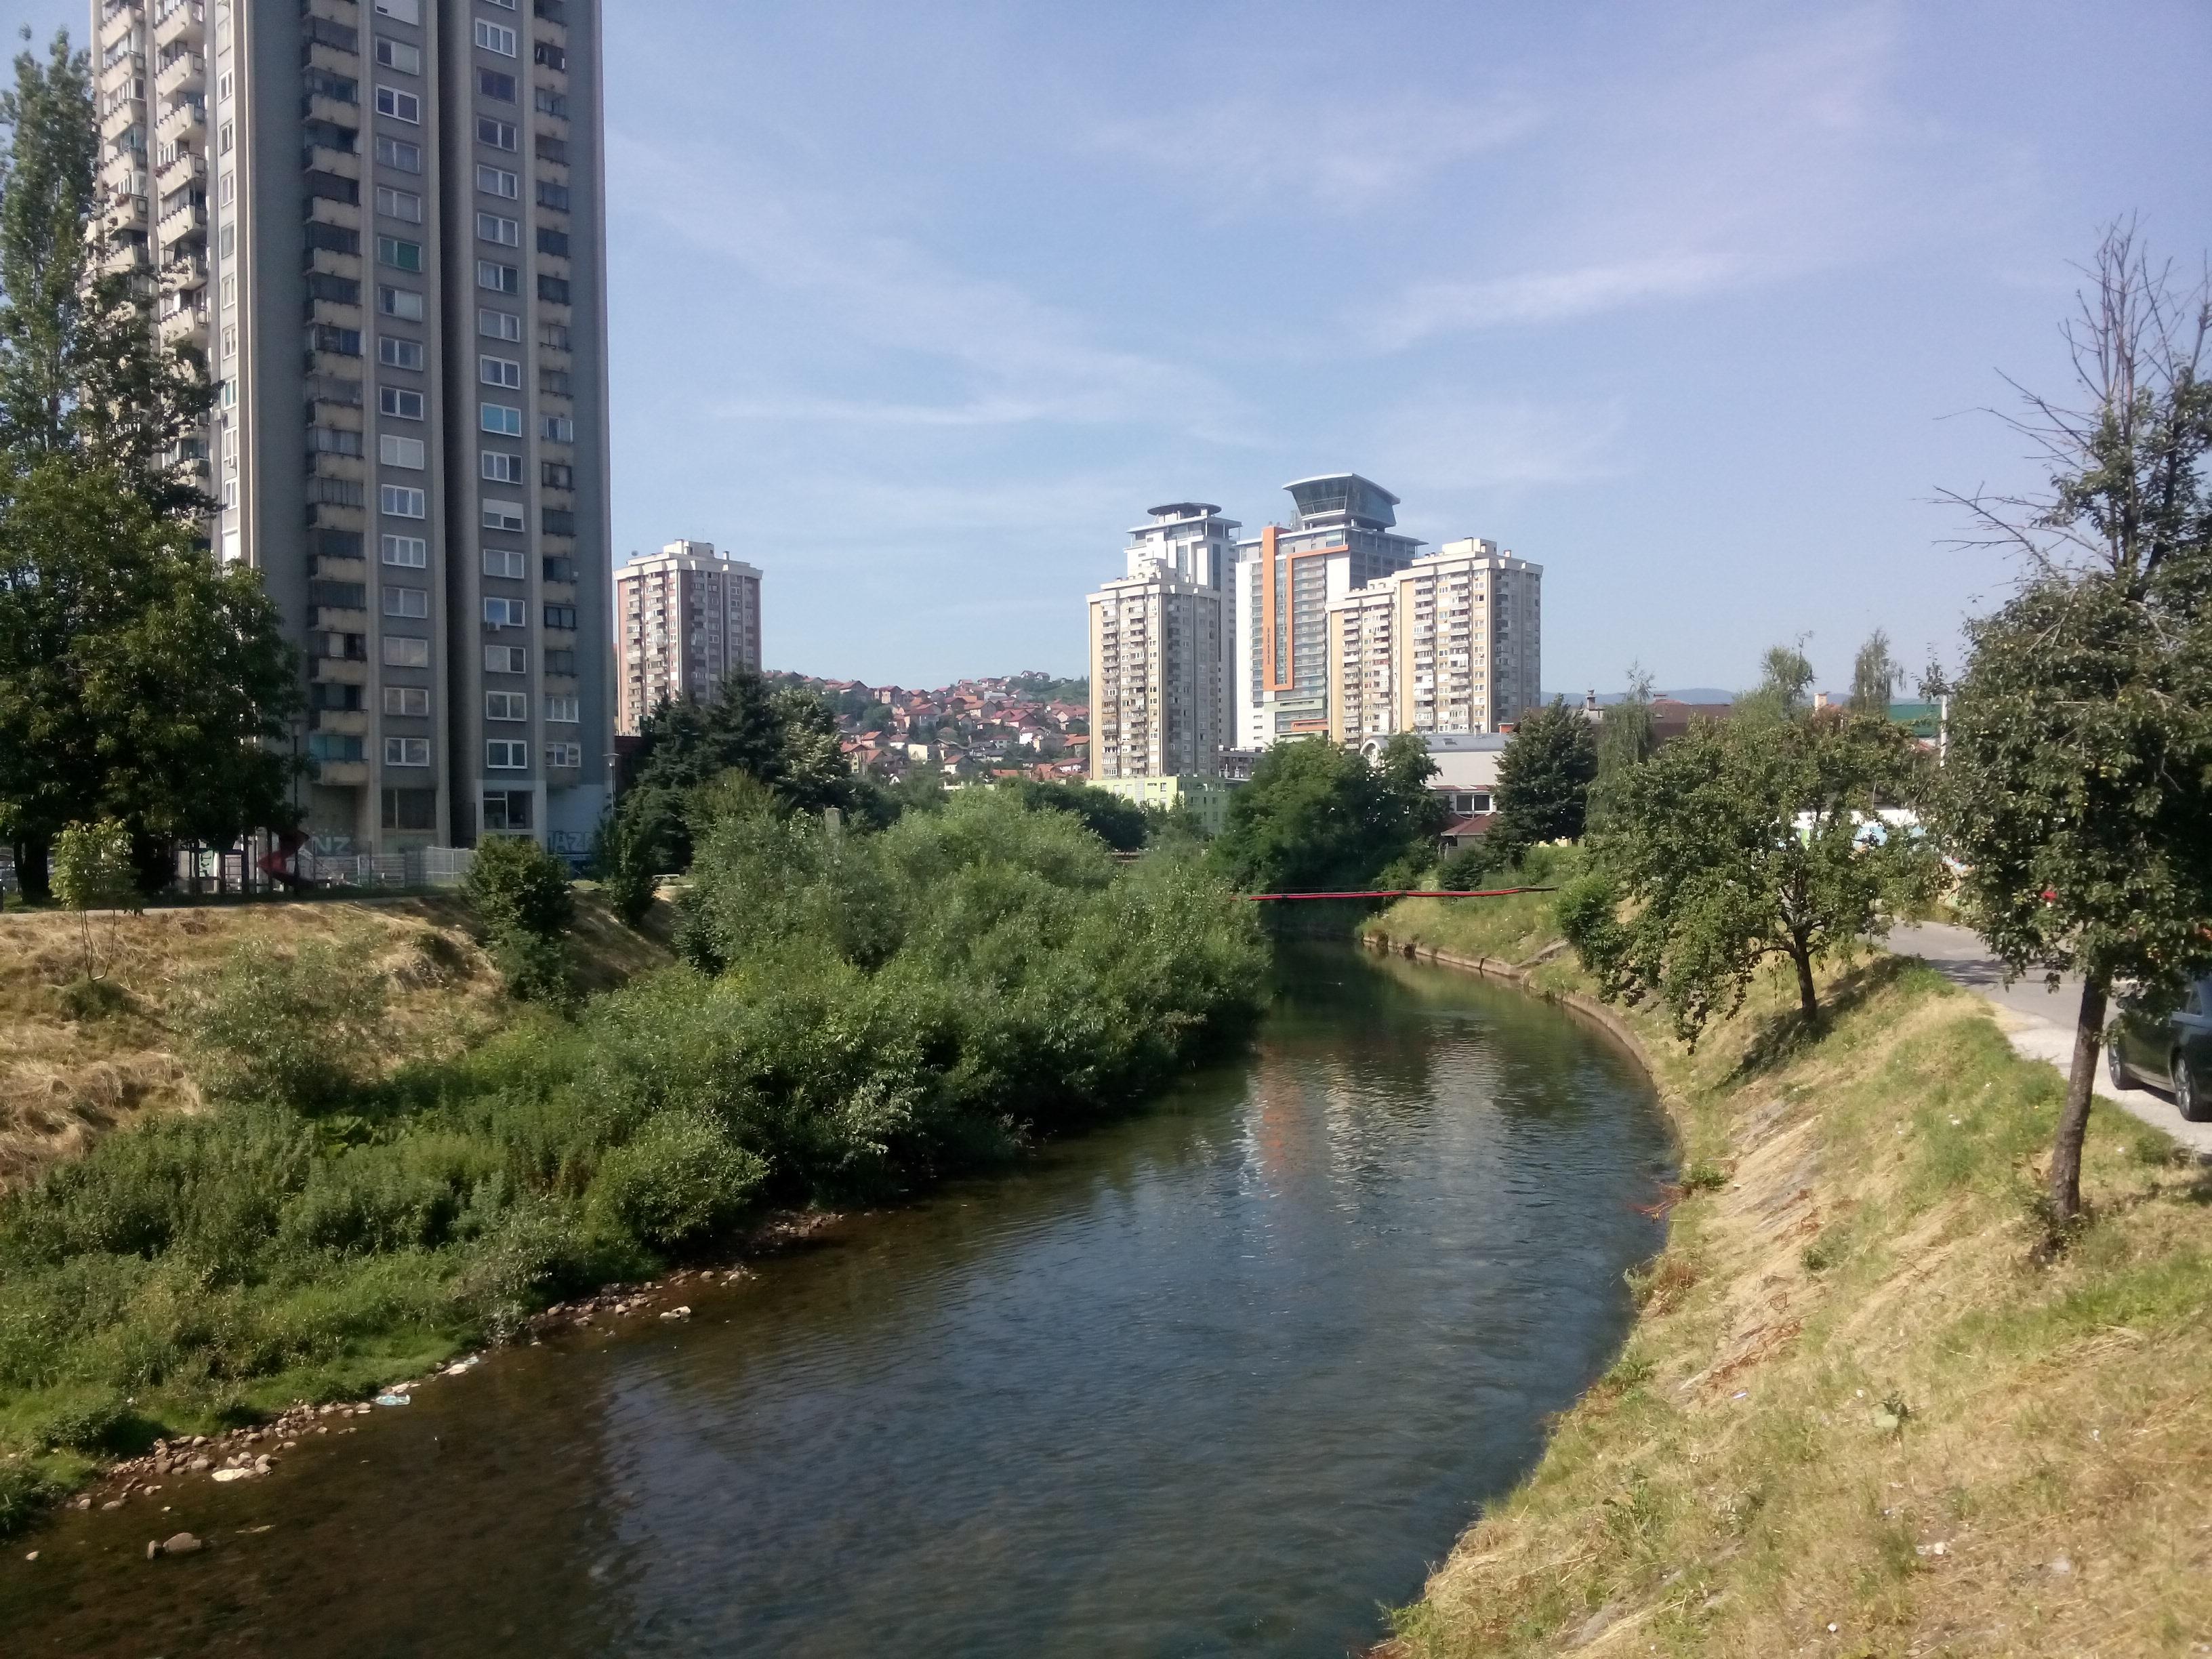 https://i.amy.gy/2017-sarajevo/IMG_20170625_093441.jpg